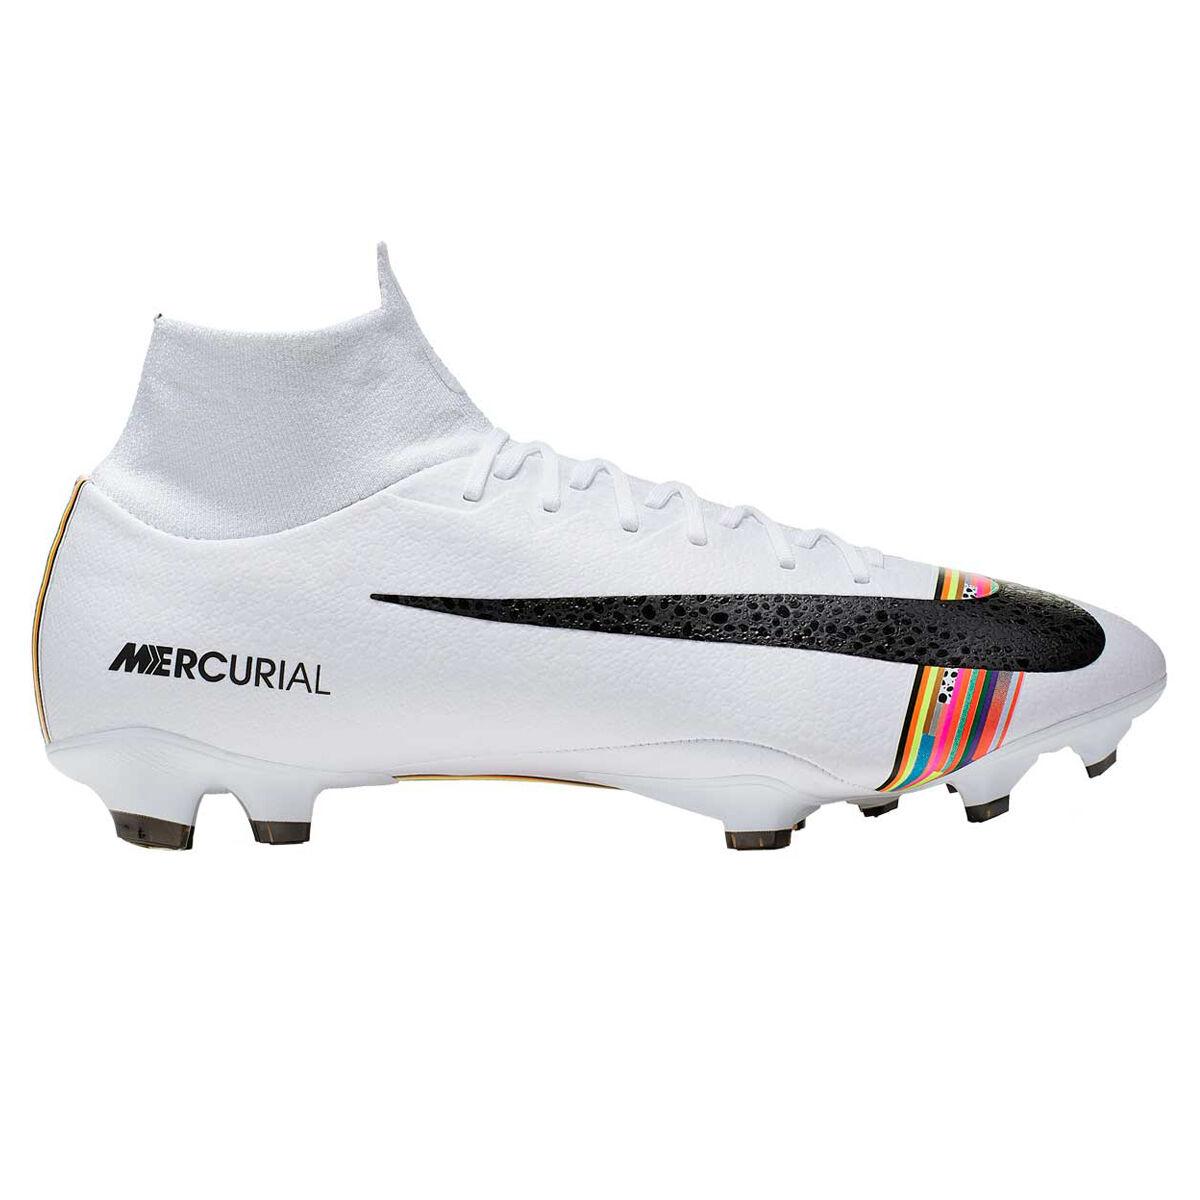 Nike Mercurial Superfly VI Pro Football